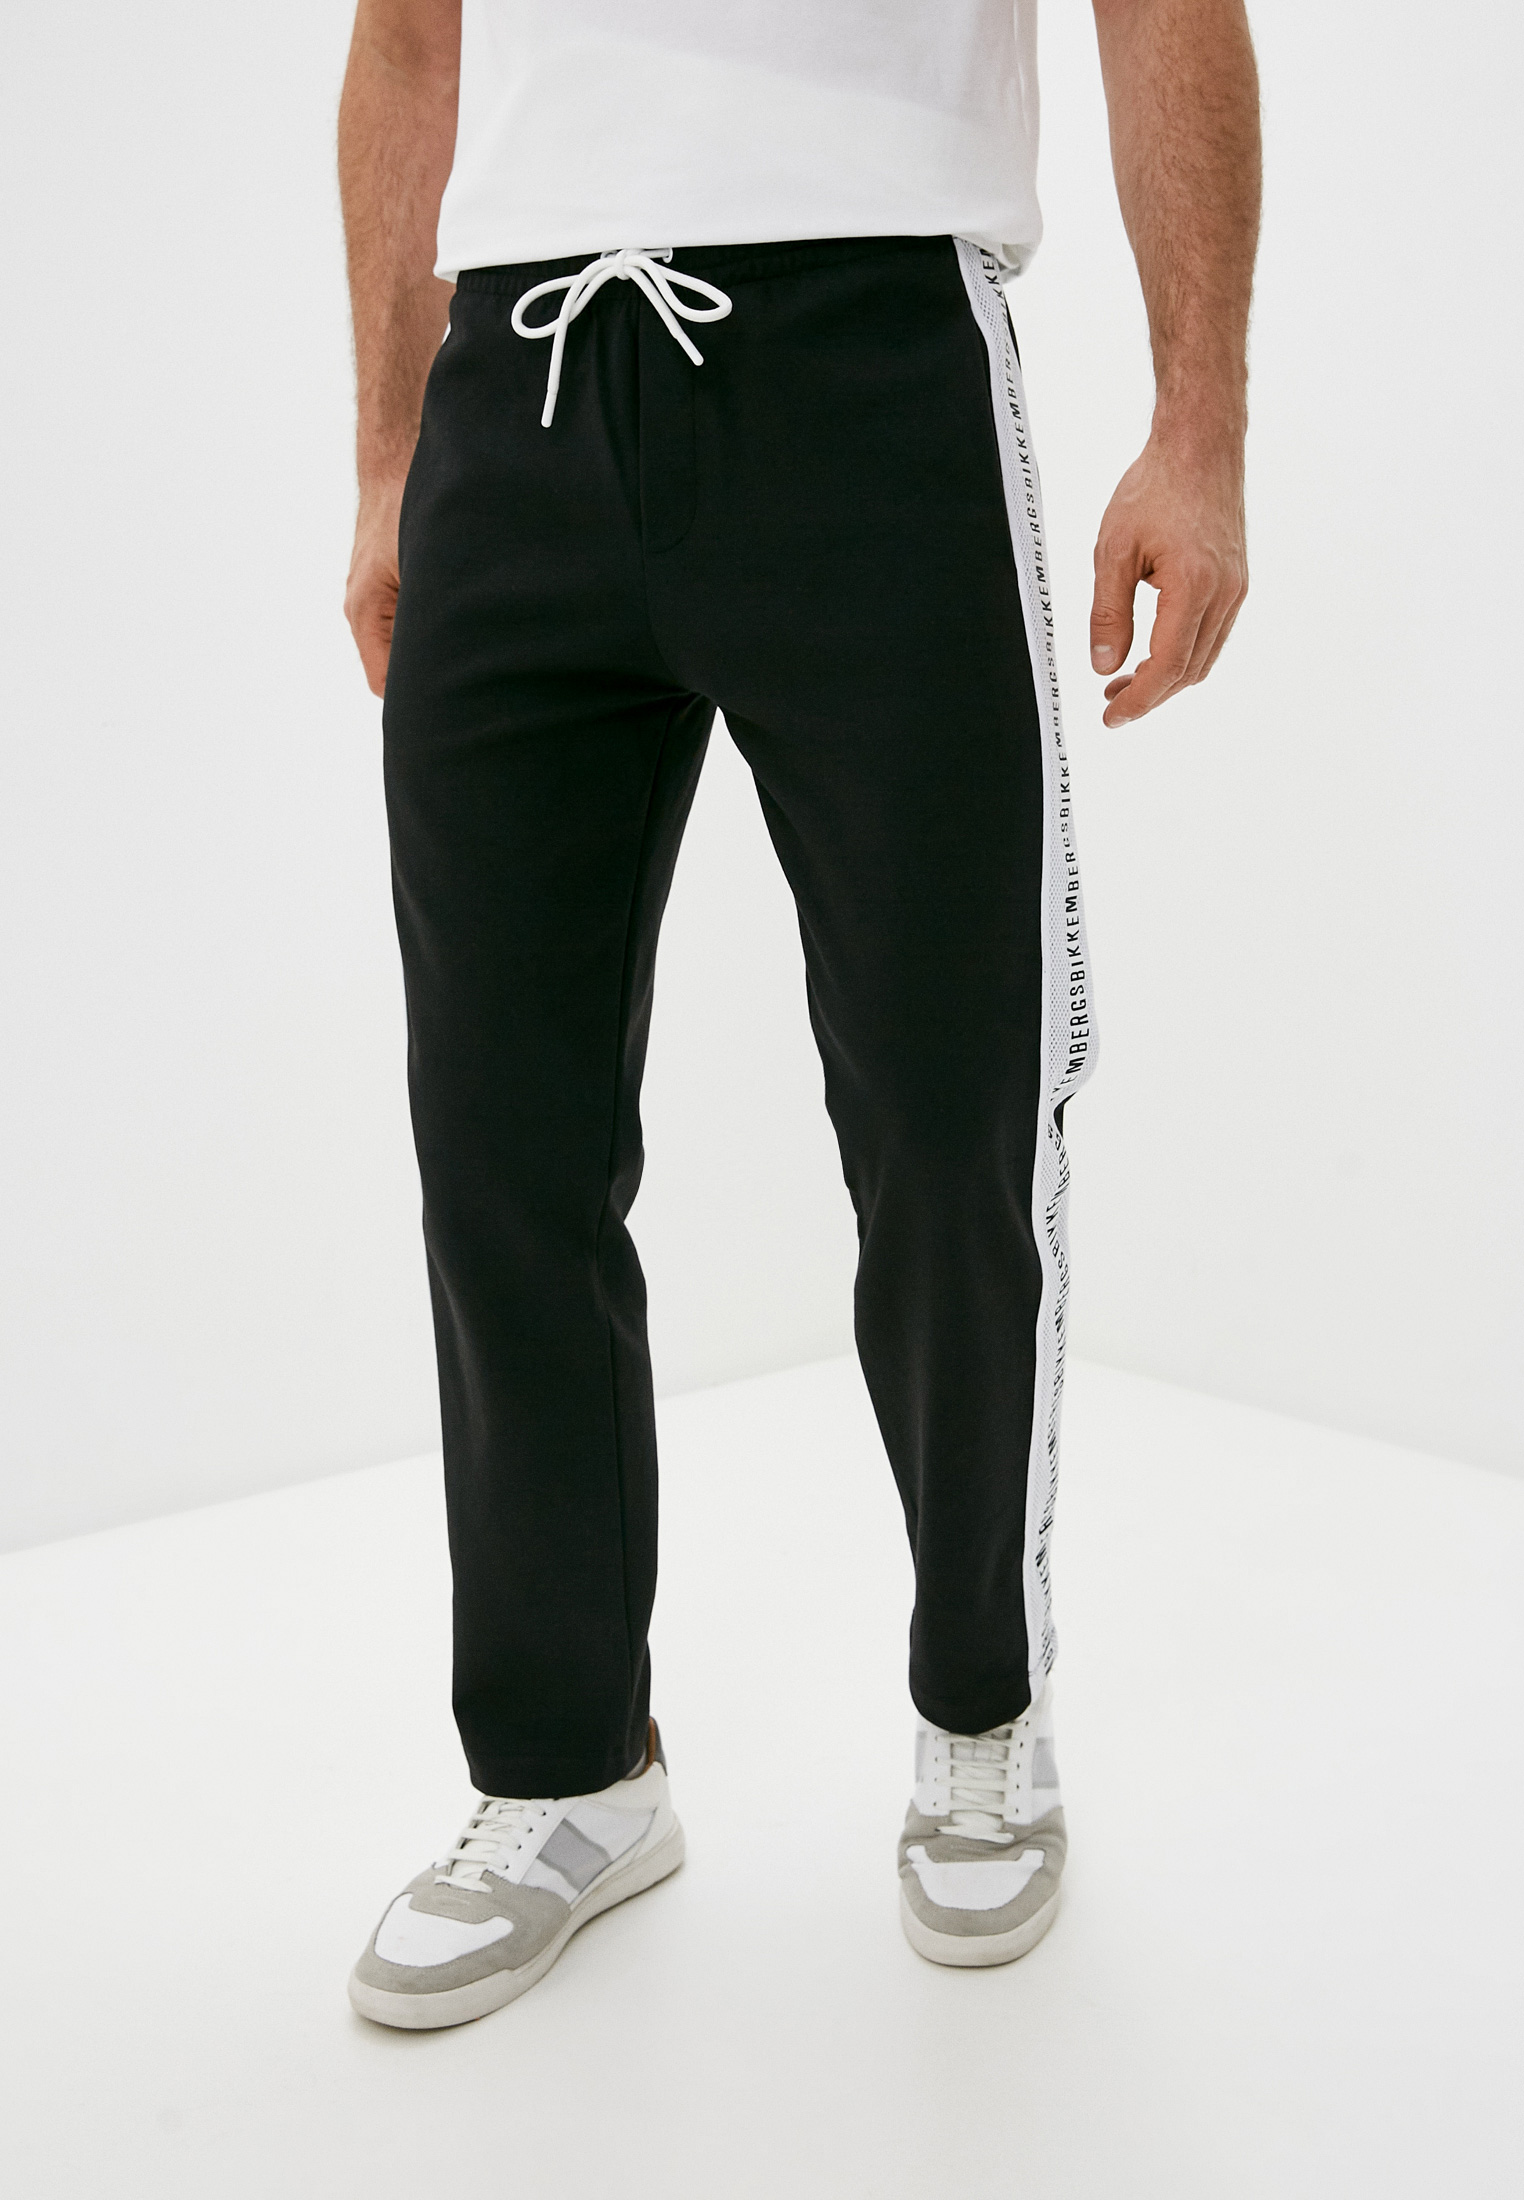 Мужские спортивные брюки Bikkembergs (Биккембергс) C 1 174 80 M 4272